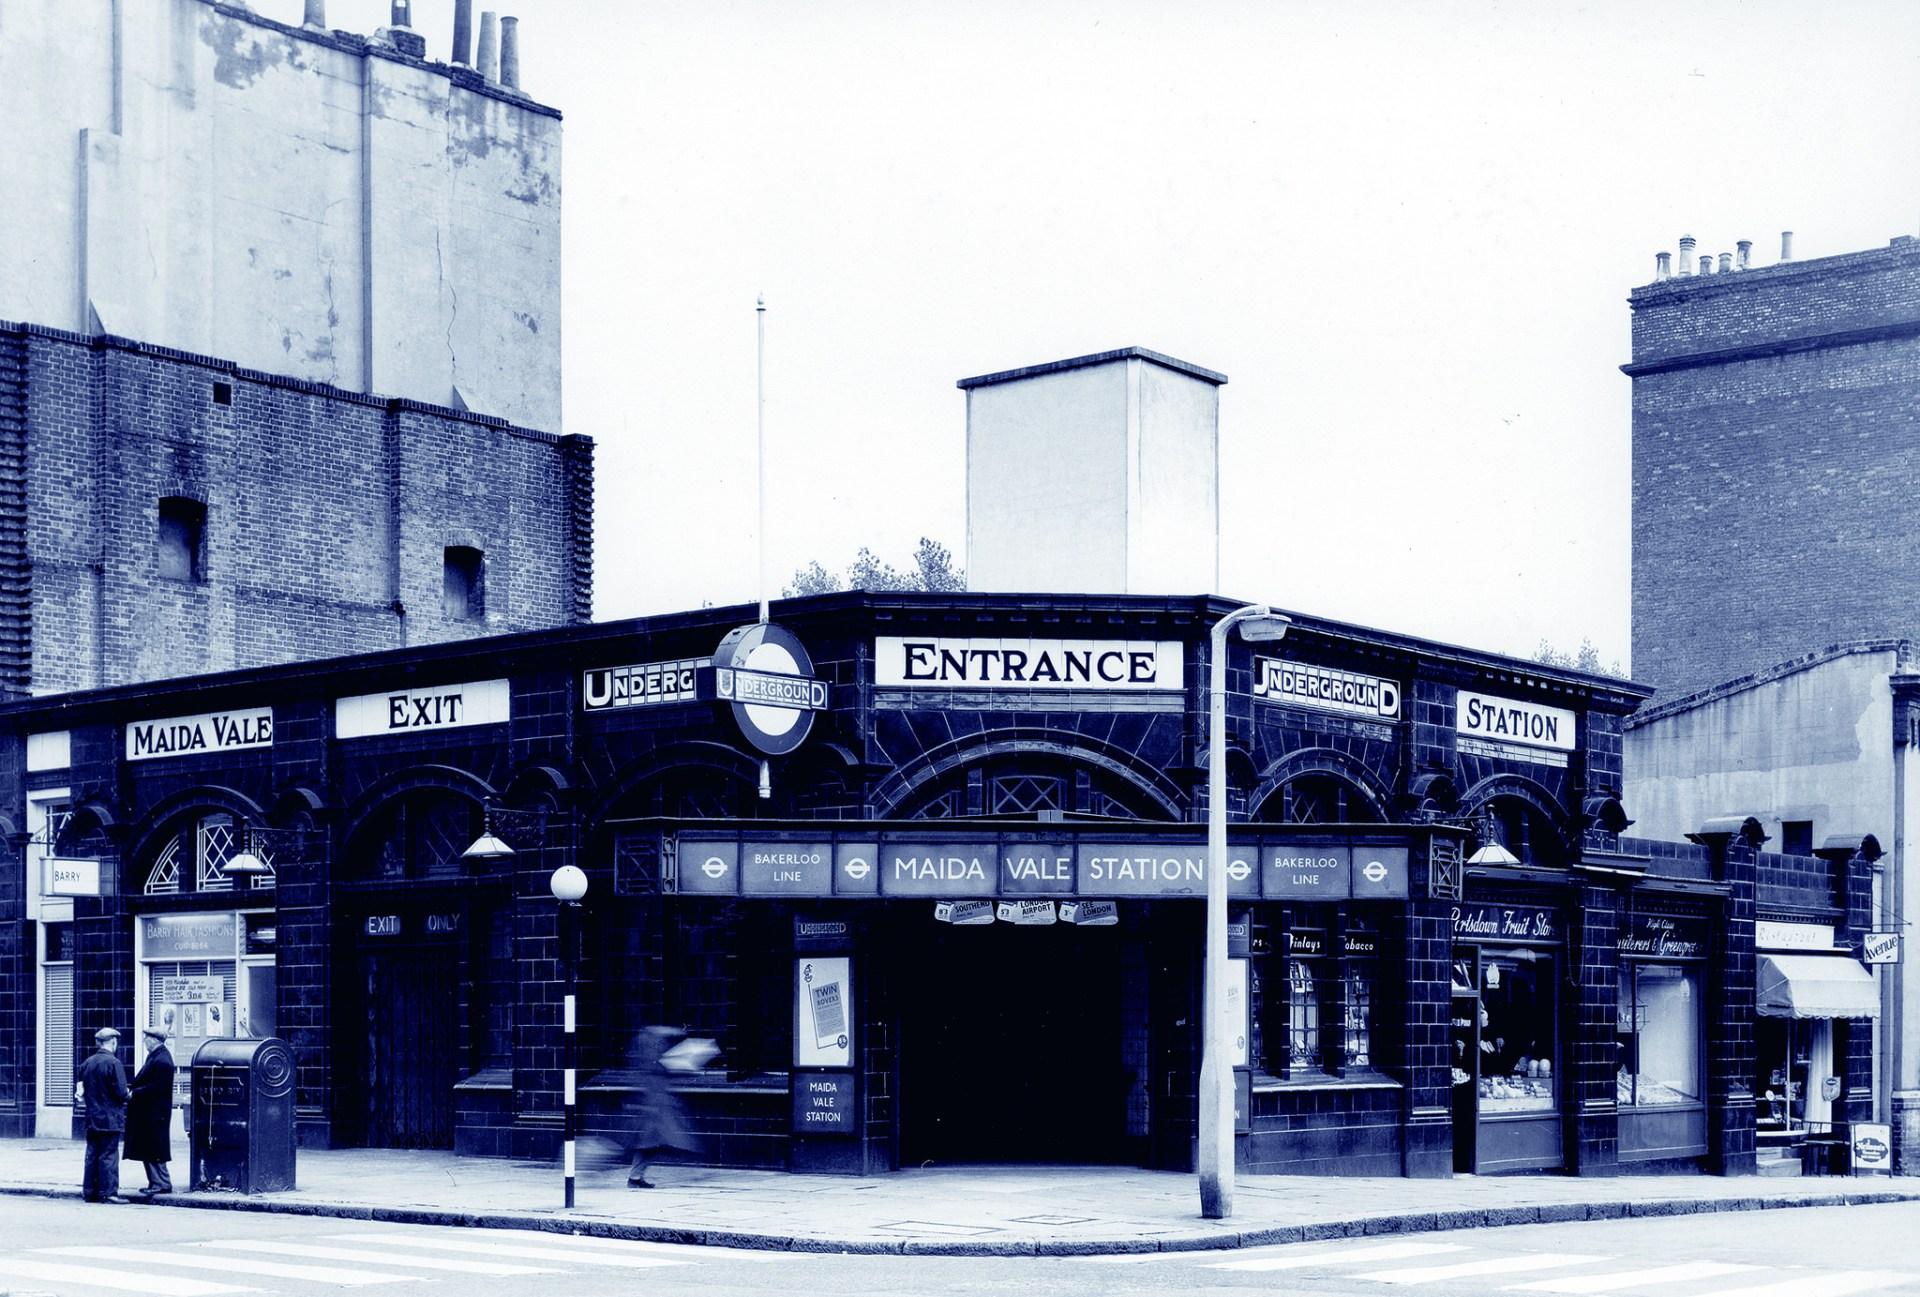 Uk Railway Stations # 5: Maida Vale, London